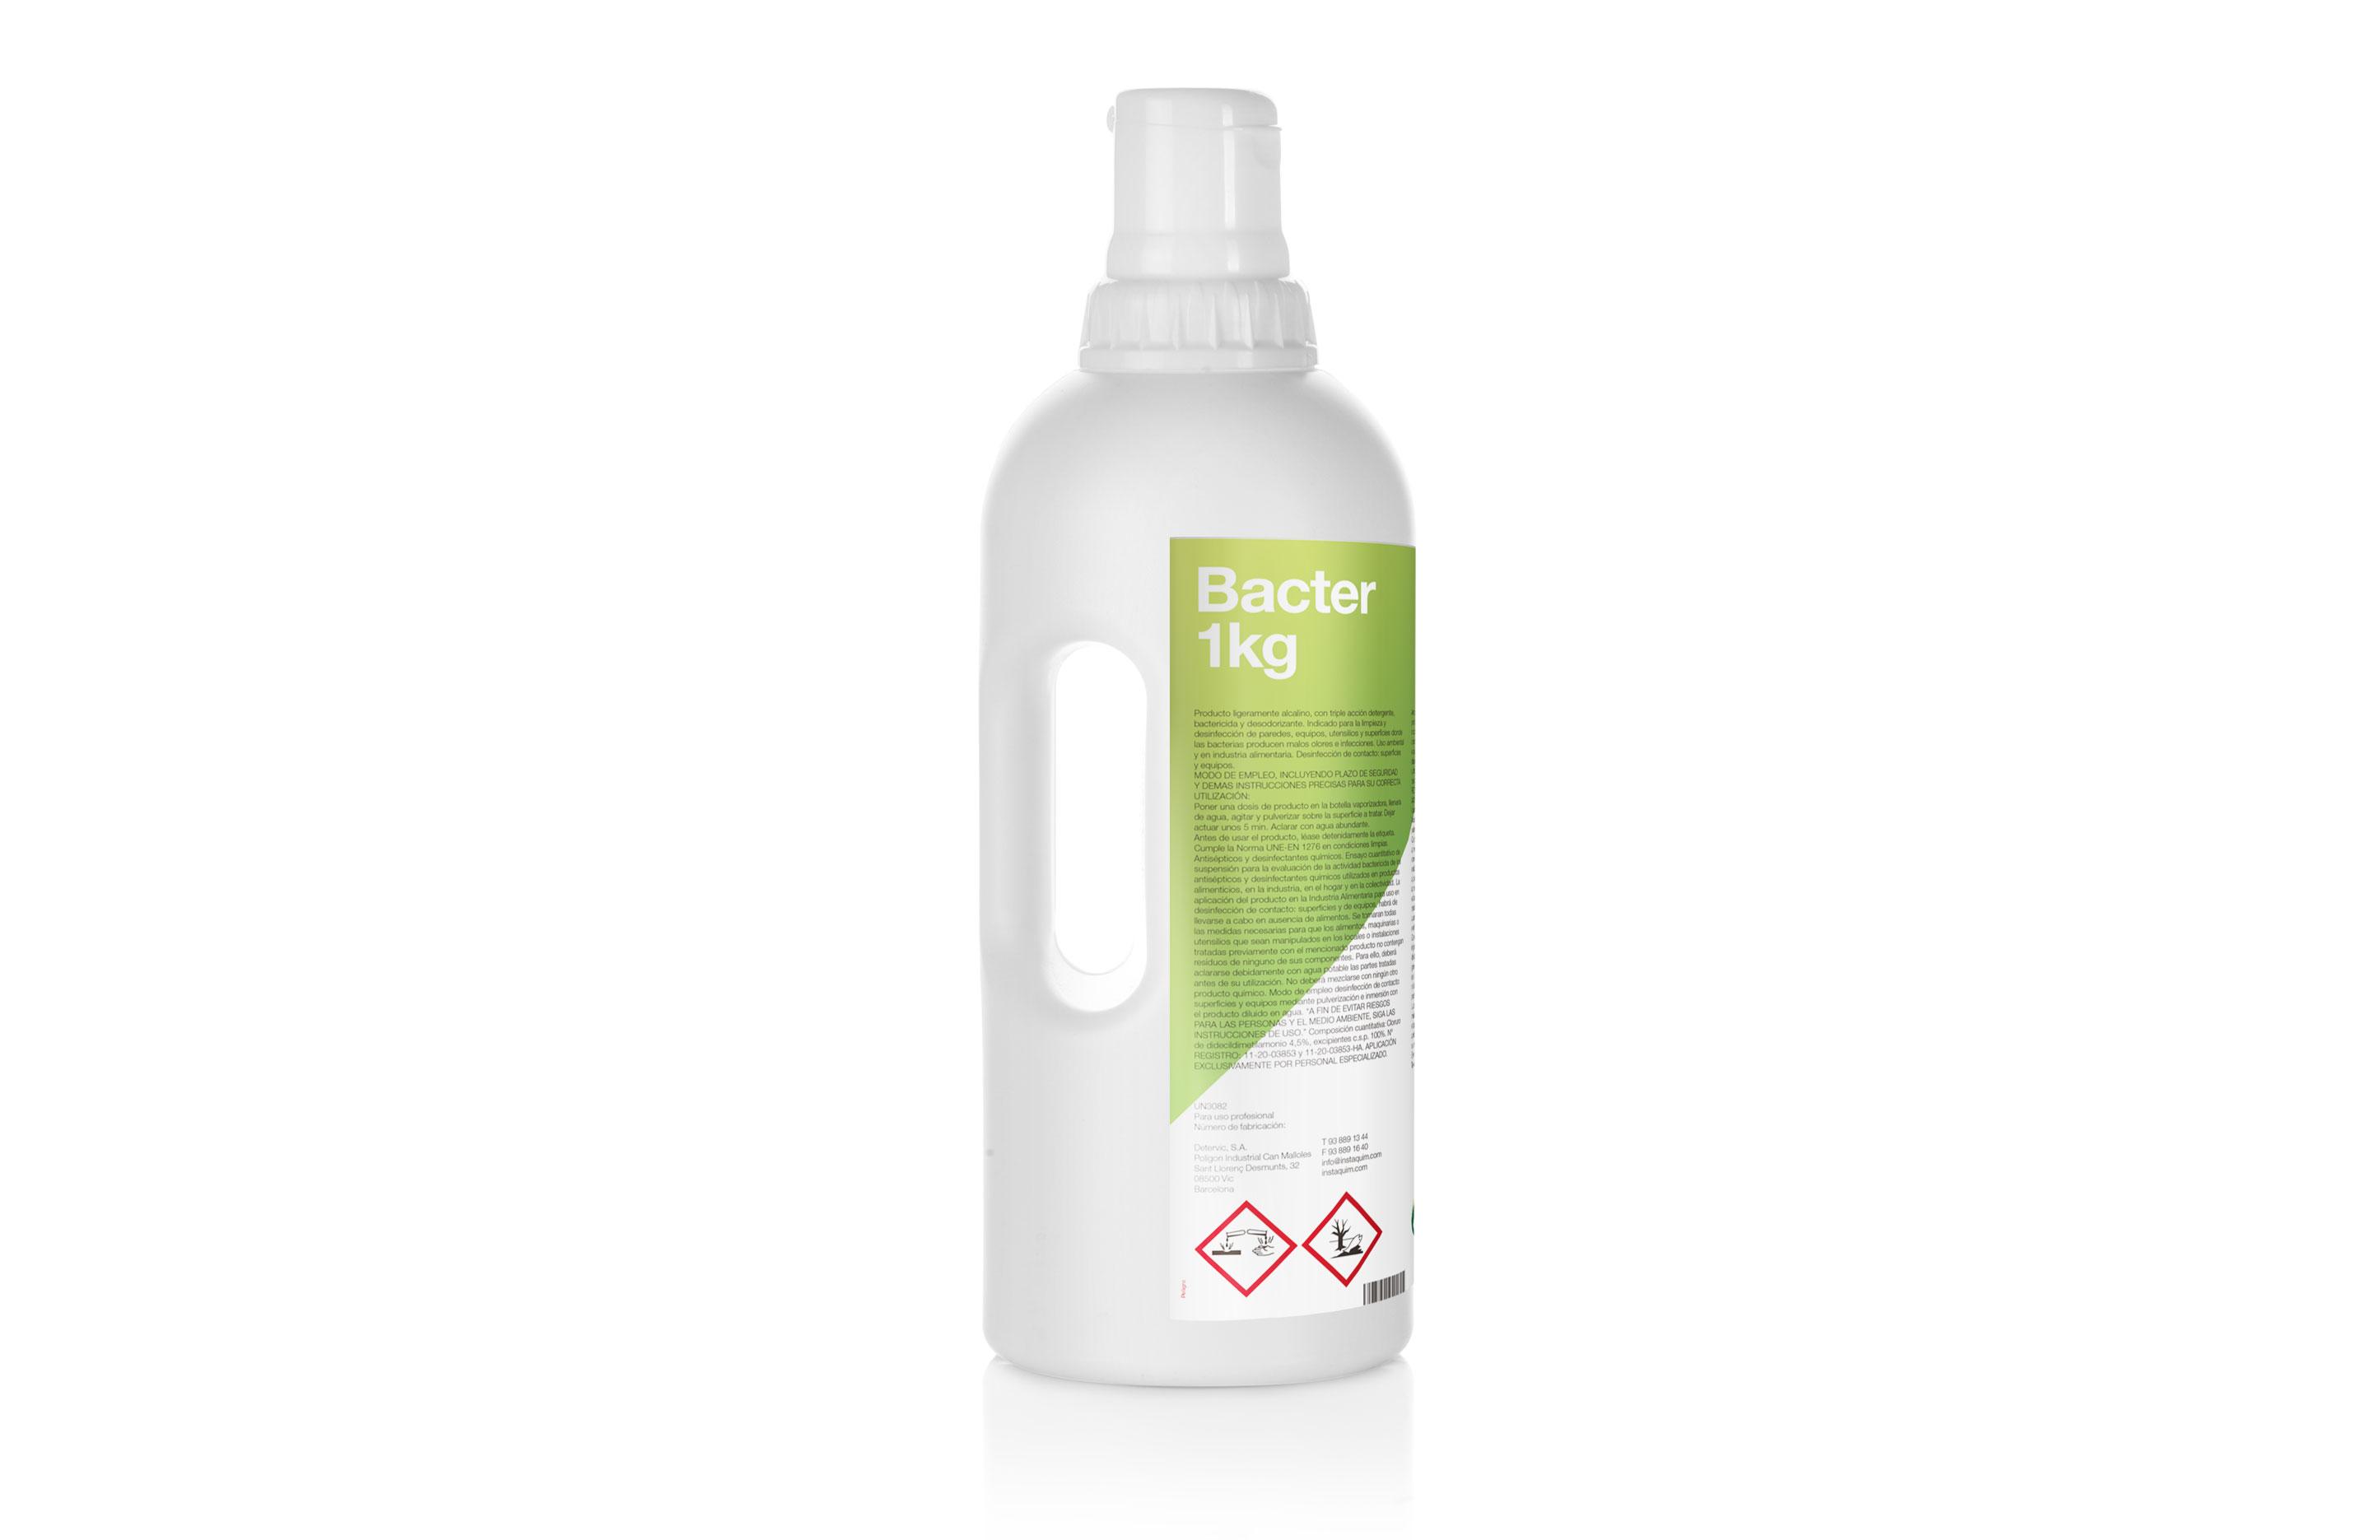 Bacter Autodosis, Disinfectant detergent